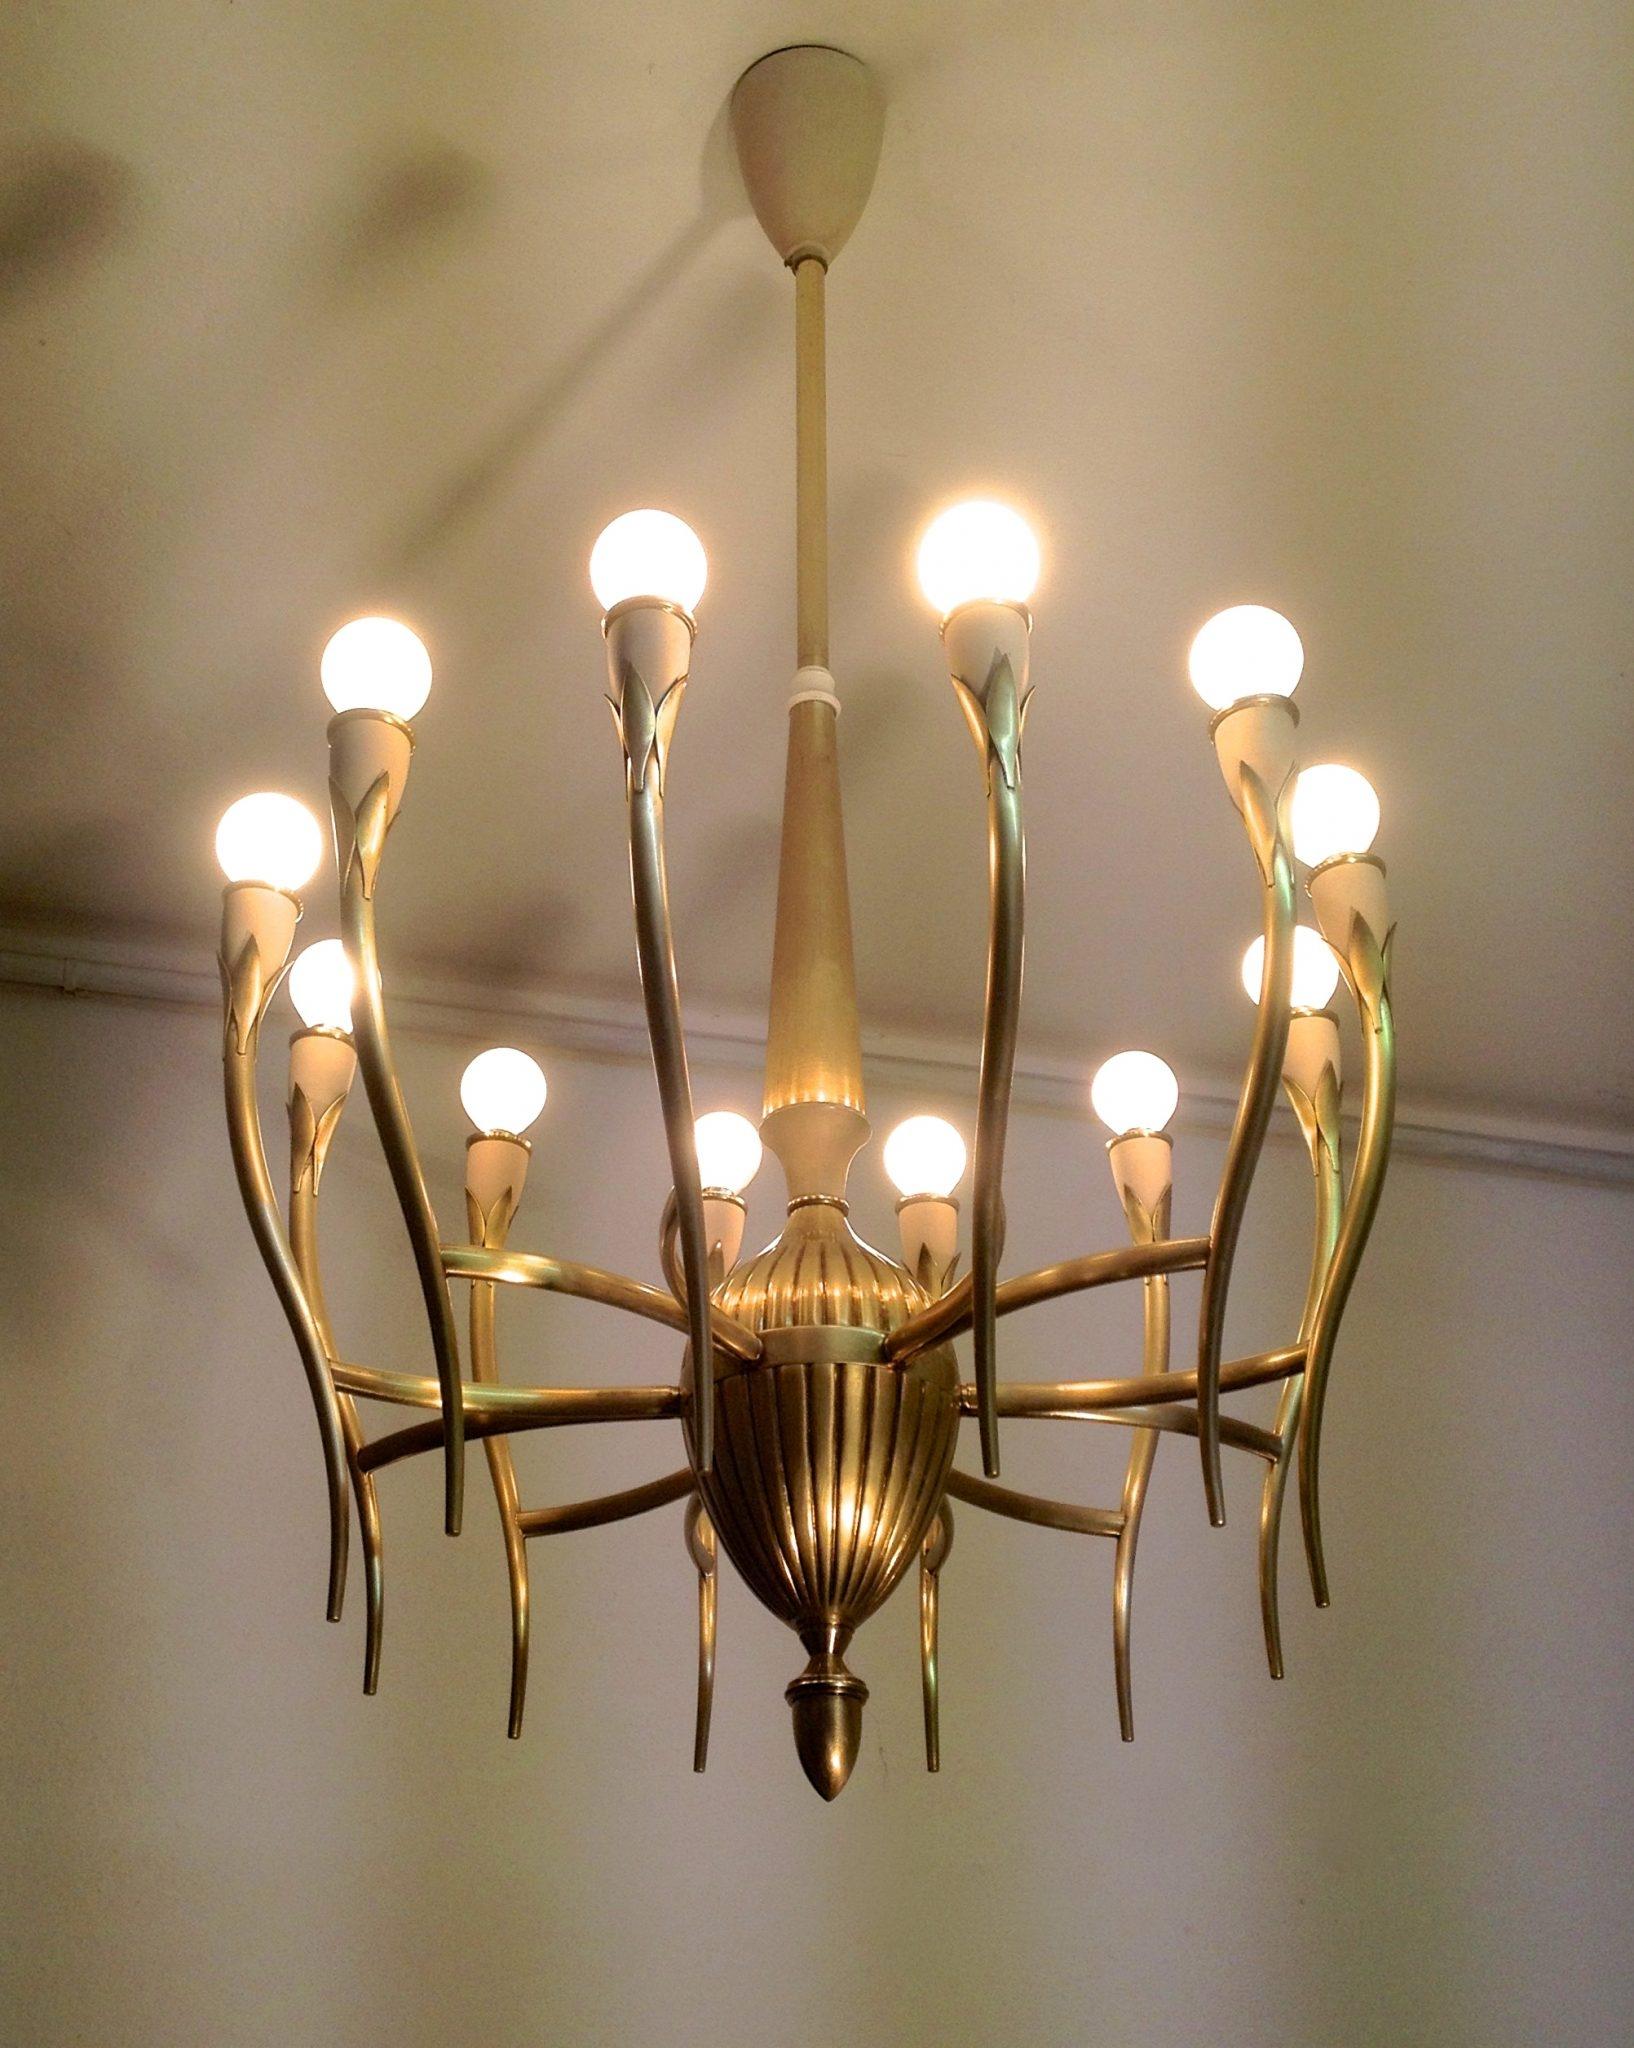 Brass Italian Mid Century Chandelier In The Style Of Guglielmo In Italian Chandelier Style (Image 5 of 15)